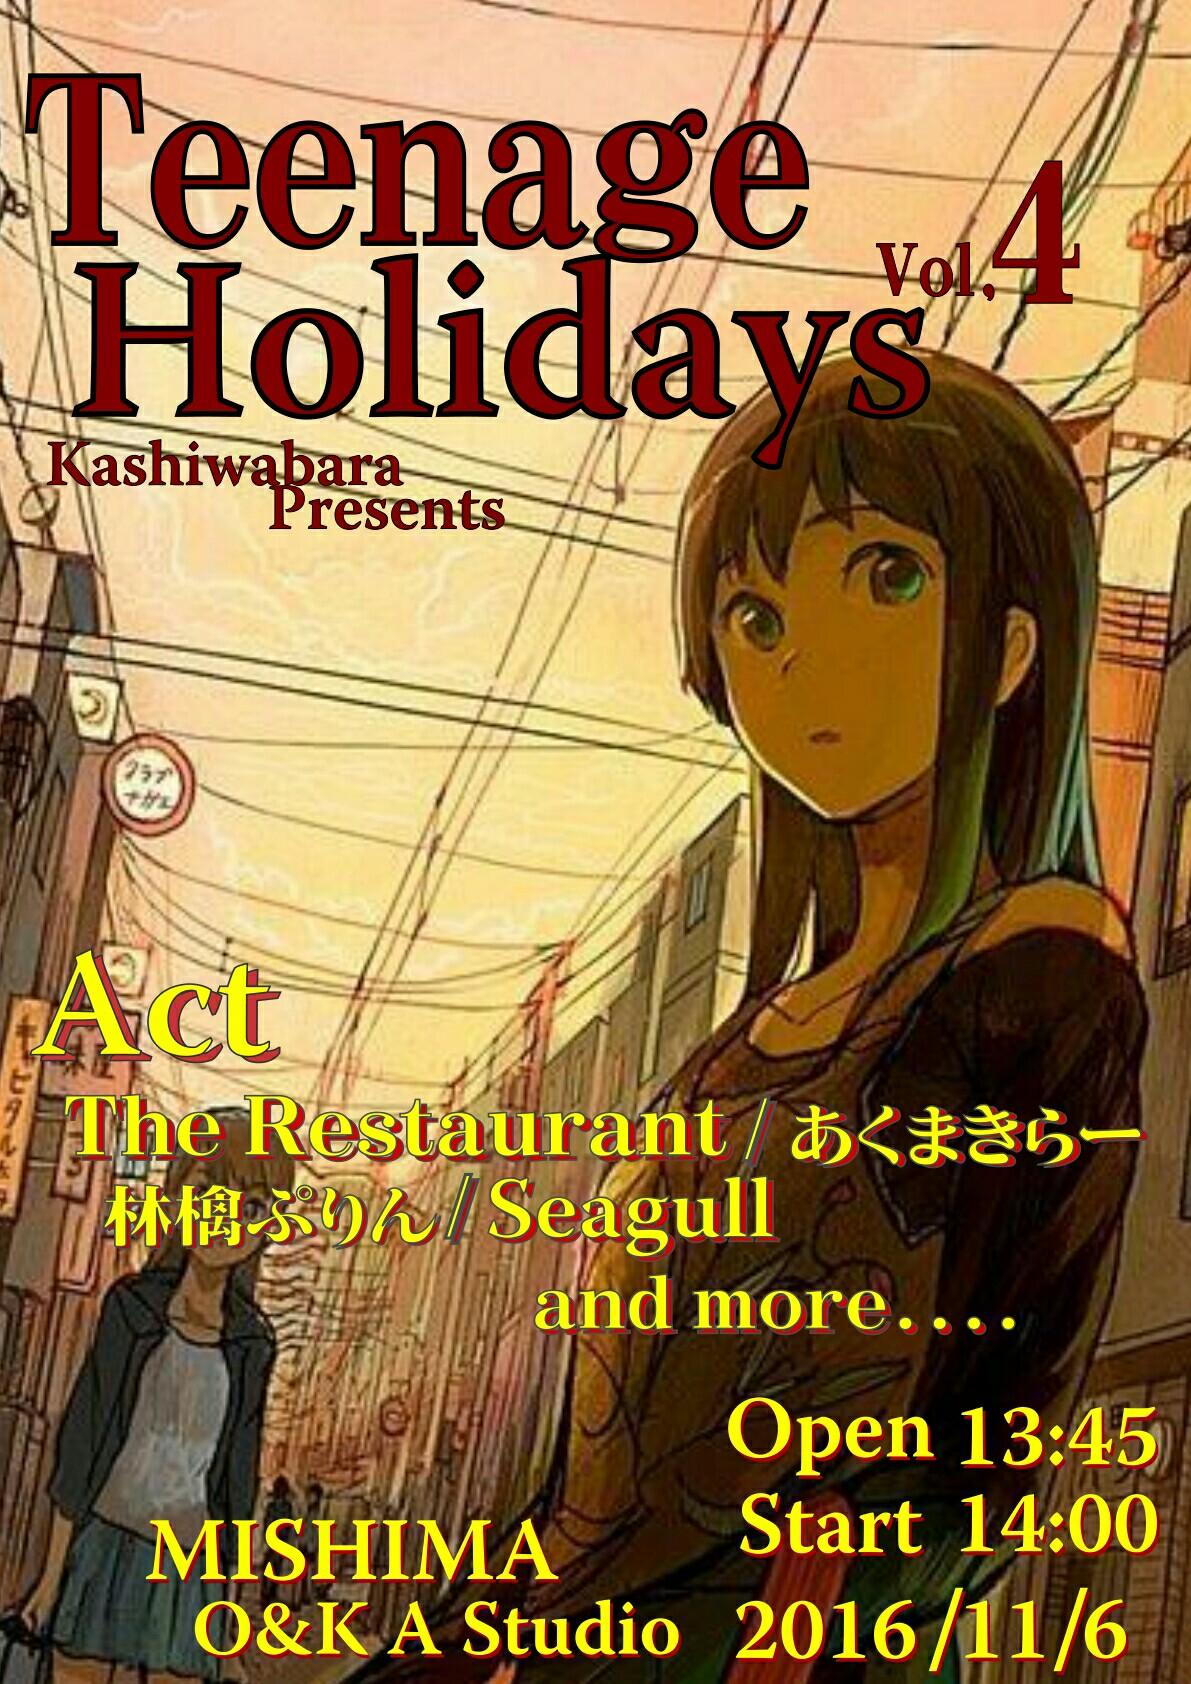 f:id:kashiwa16:20161031232522j:image